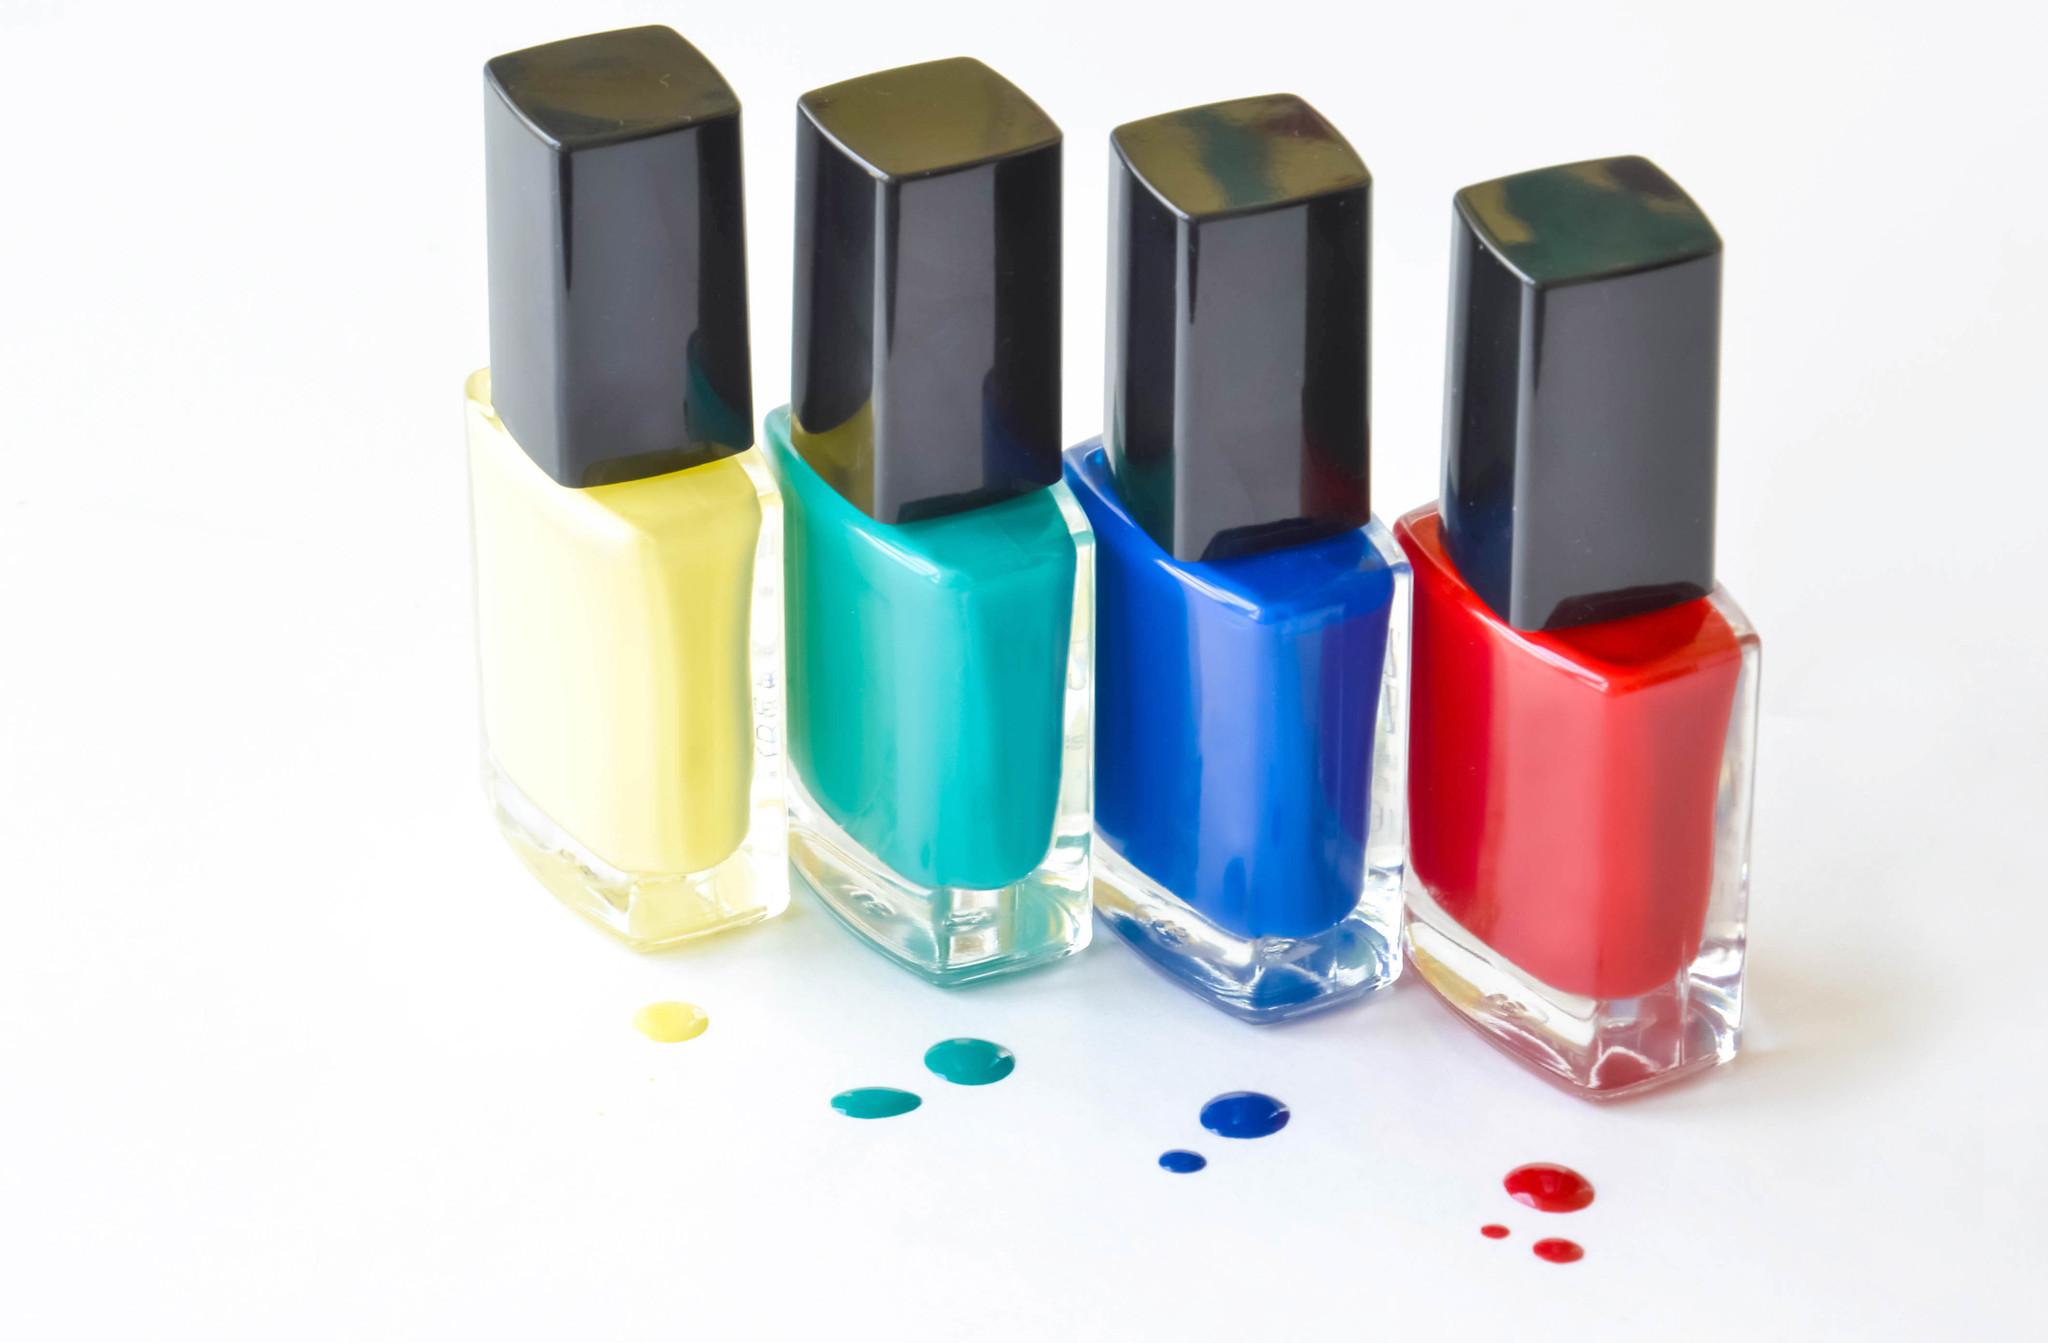 Kreative Farben